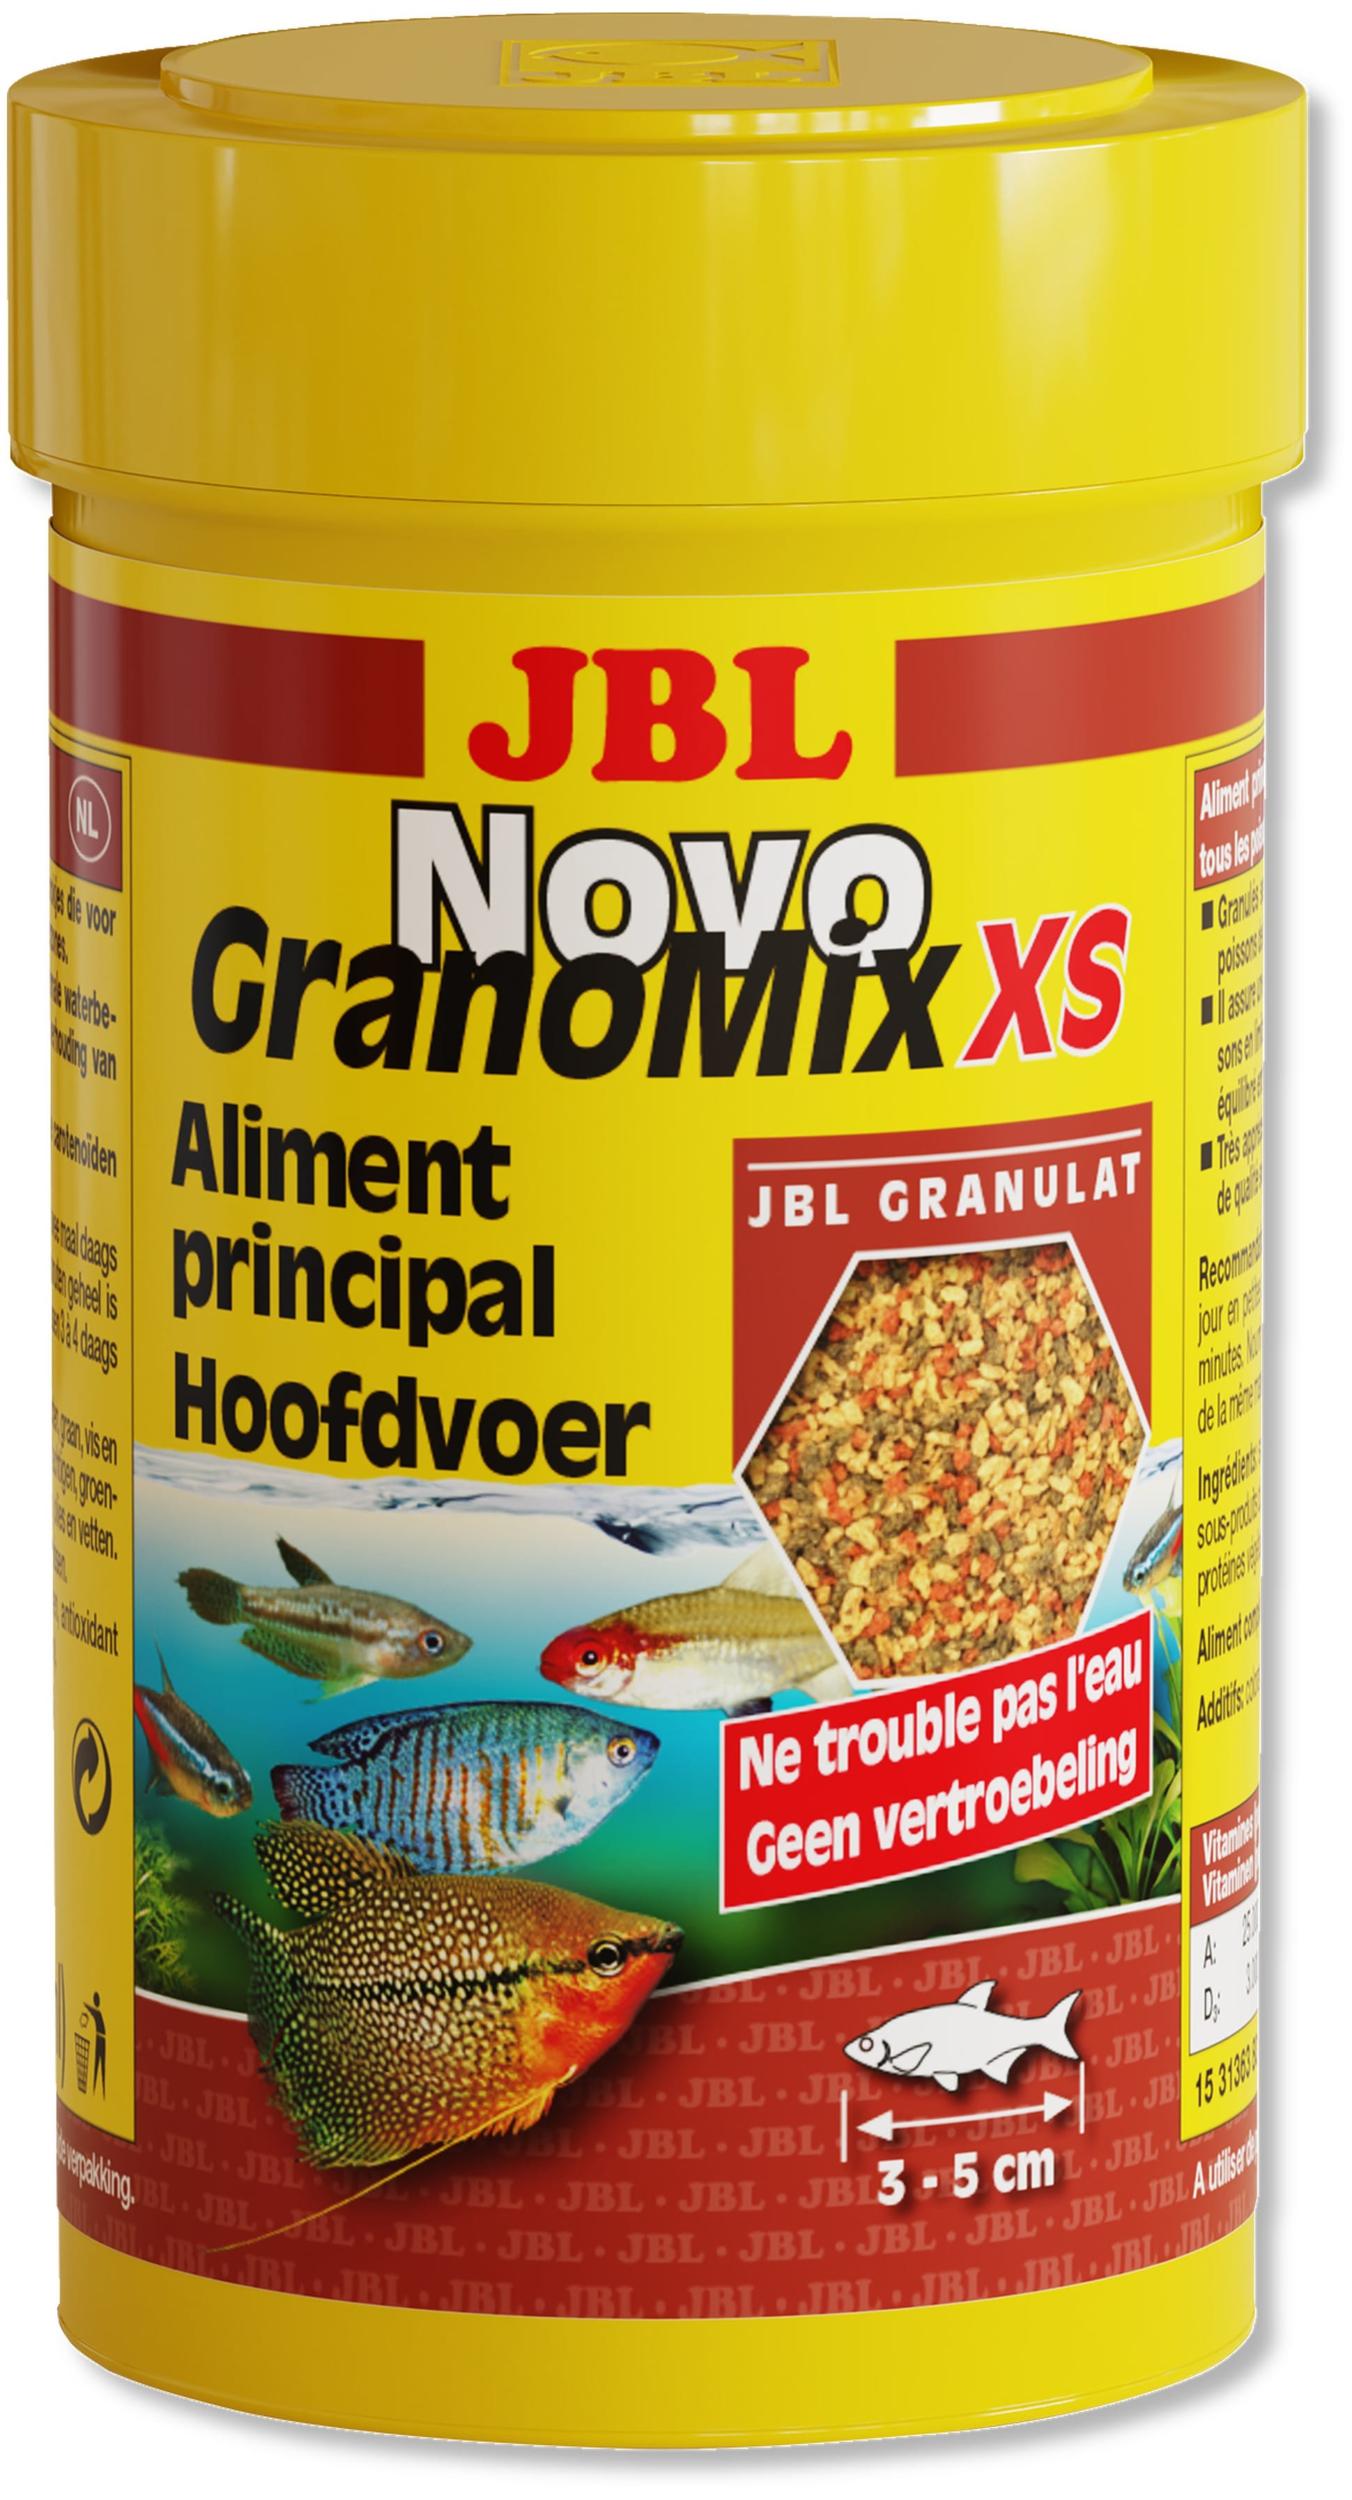 JBL NovoGranoMix XS 100 ml nourriture en granulés pour petits poissons d\'aquarium de 3 à 5 cm